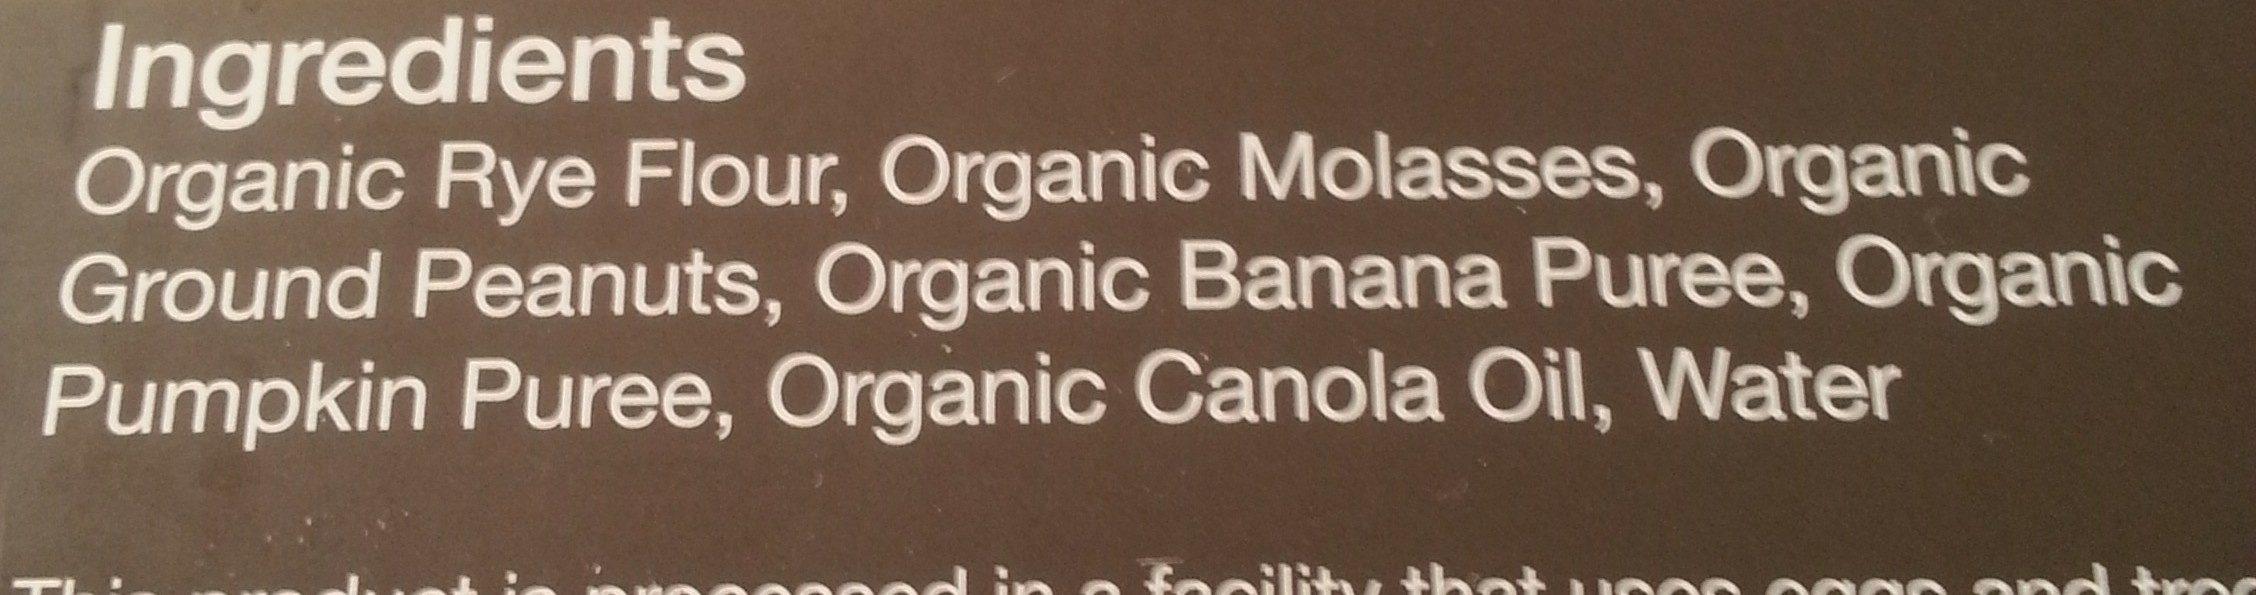 organic dog treats peanut butter with fresh bannas - Ingredients - en